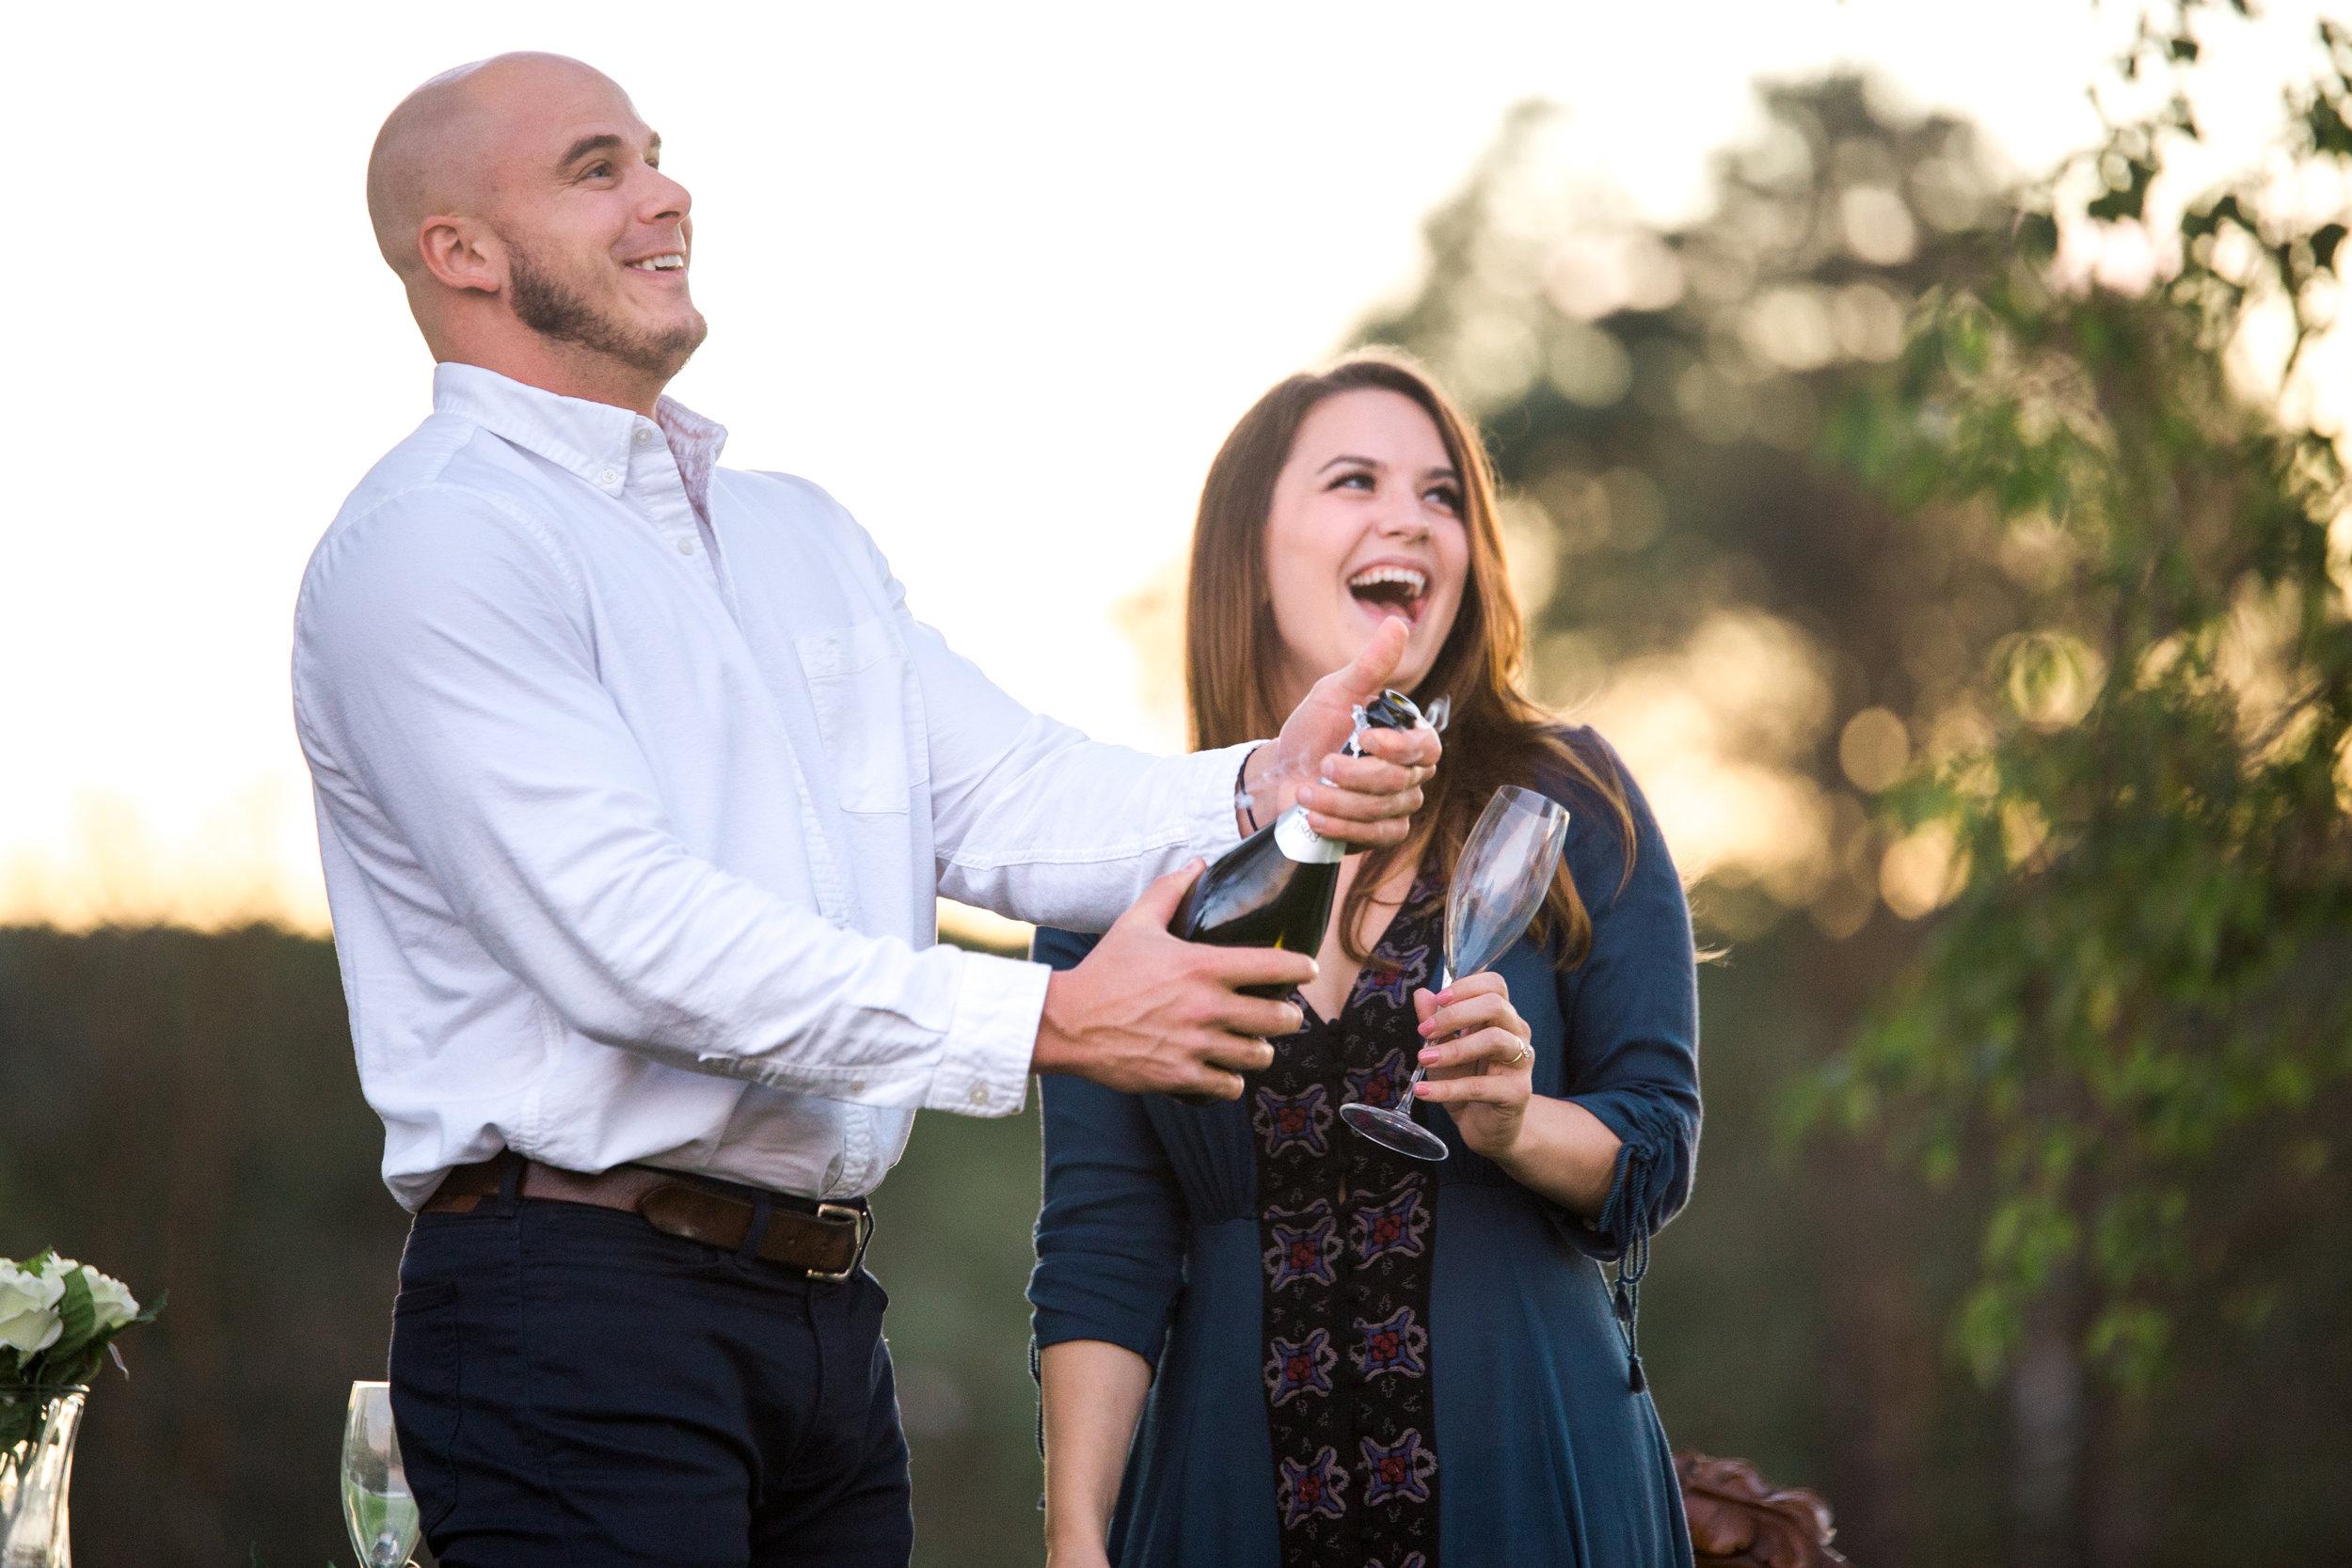 Romantic Engagement Session by Cleveland Wedding Photographer Matt Erickson Photography